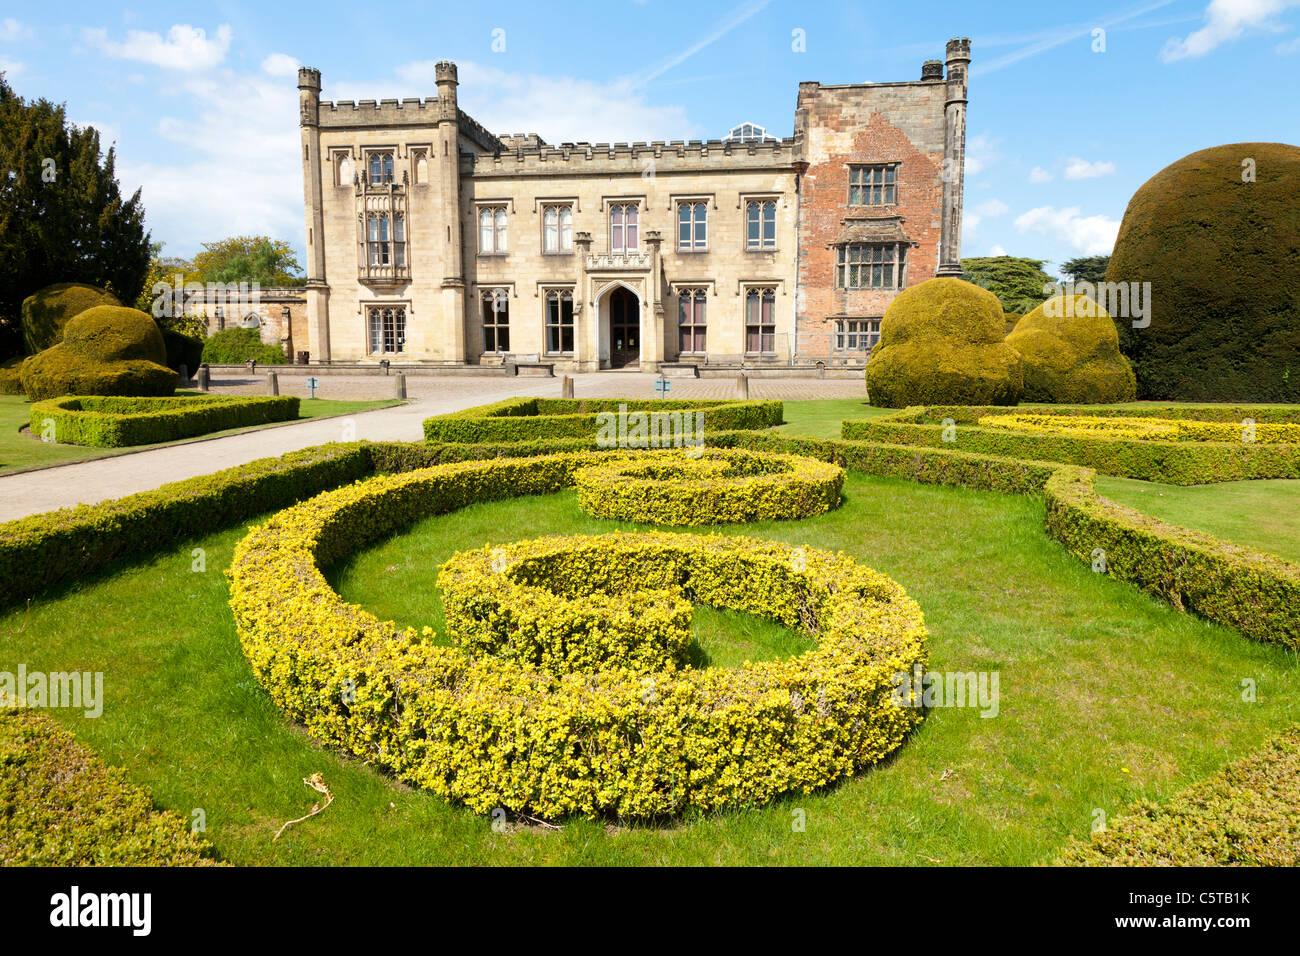 Elvaston Castle and garden Derbyshire England - Stock Image